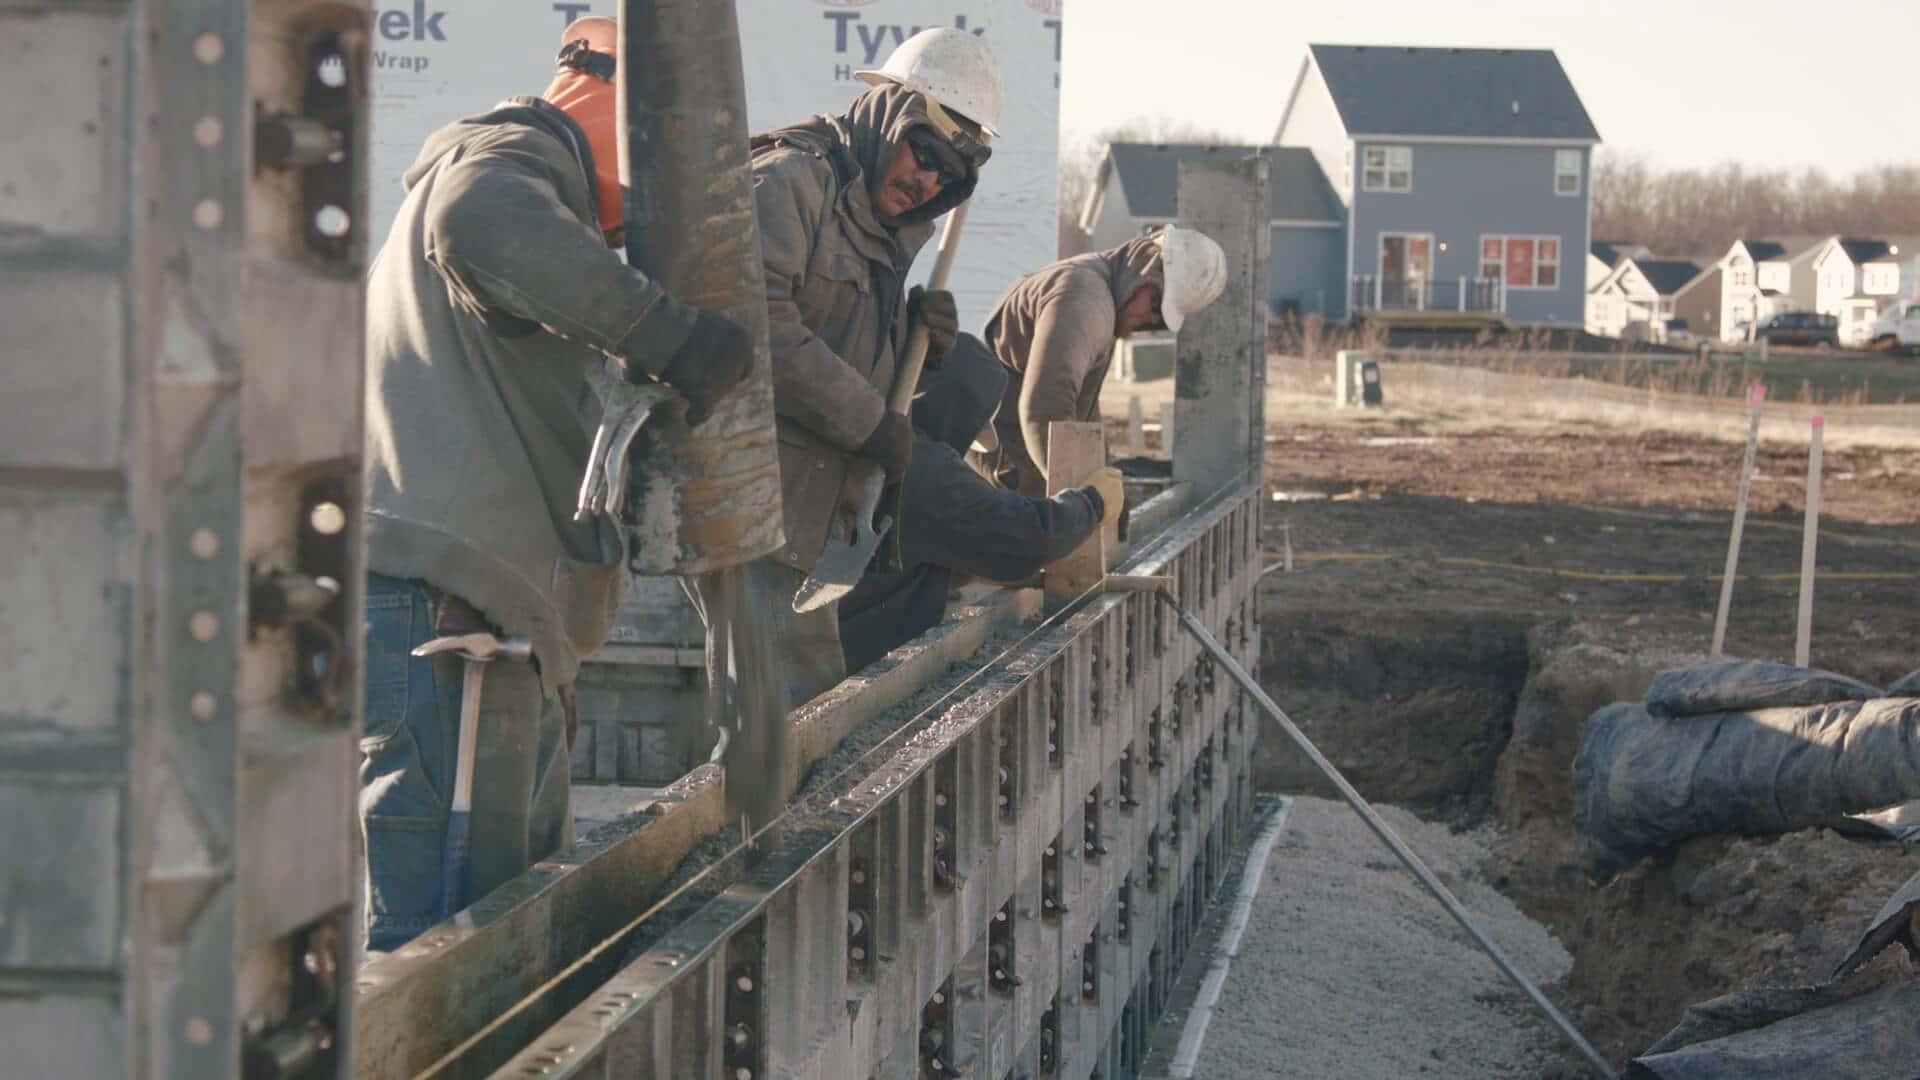 Hottman Construction